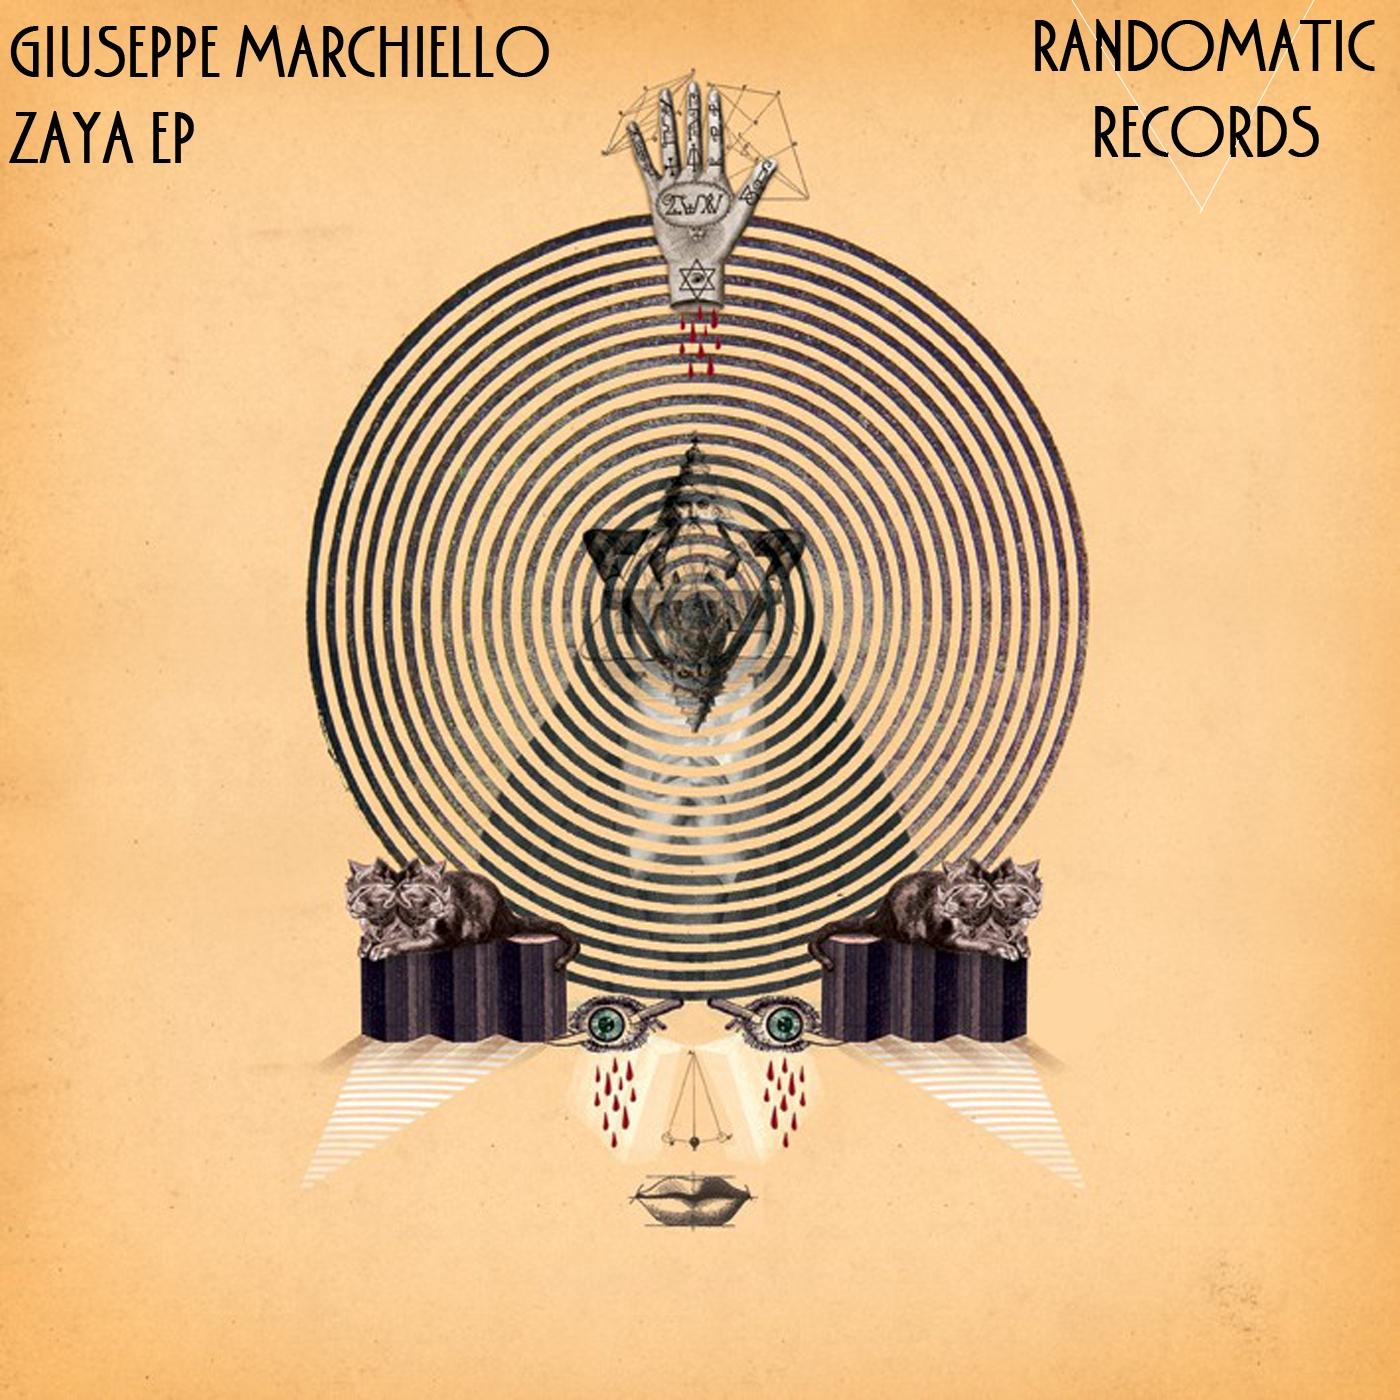 Giuseppe Marchiello - Drunk (Original mix)